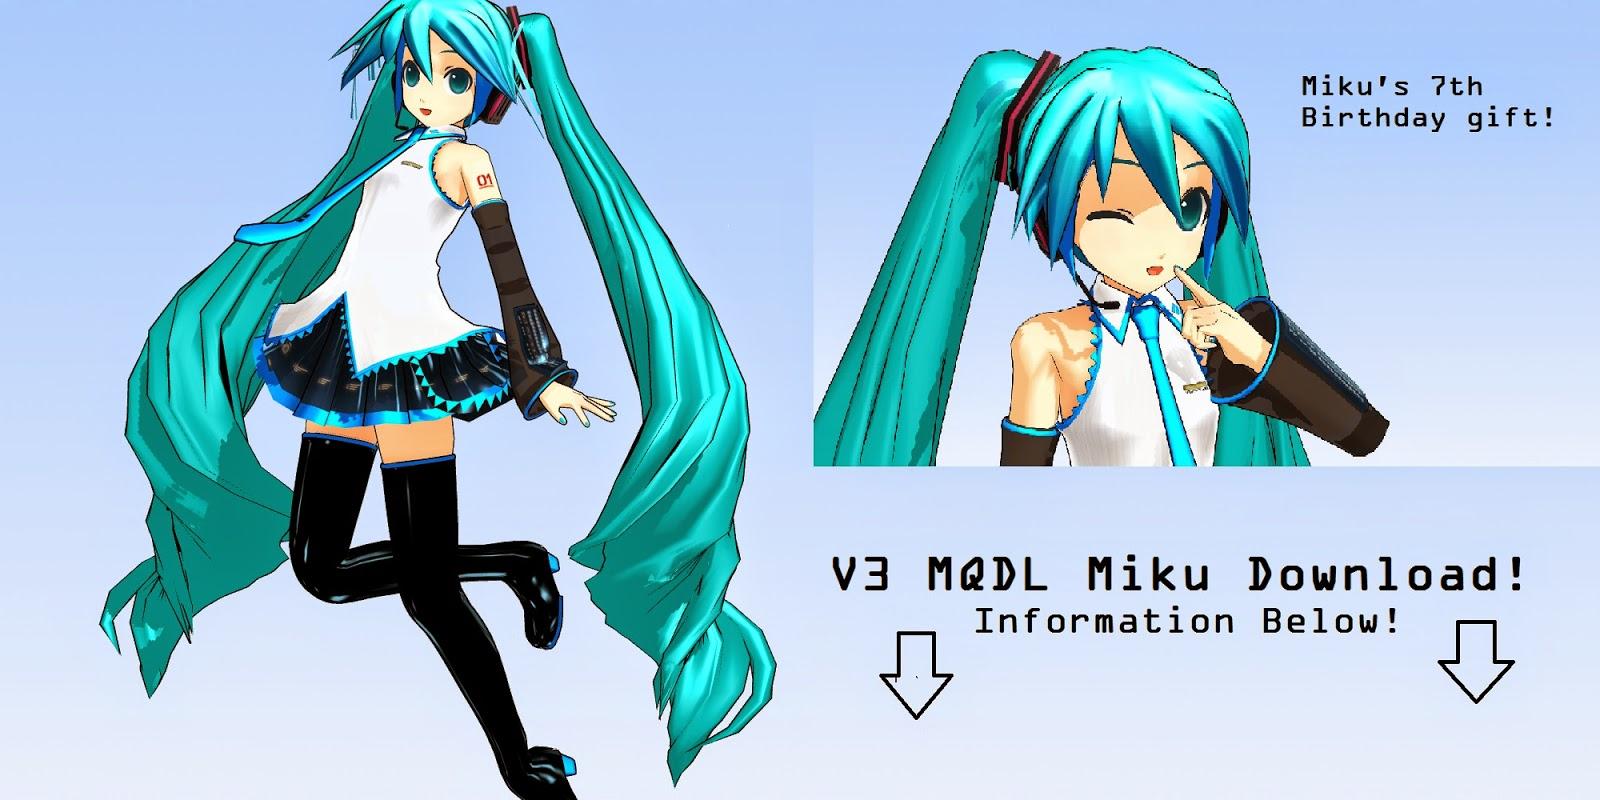 Utau XL: MMD Model Downloads